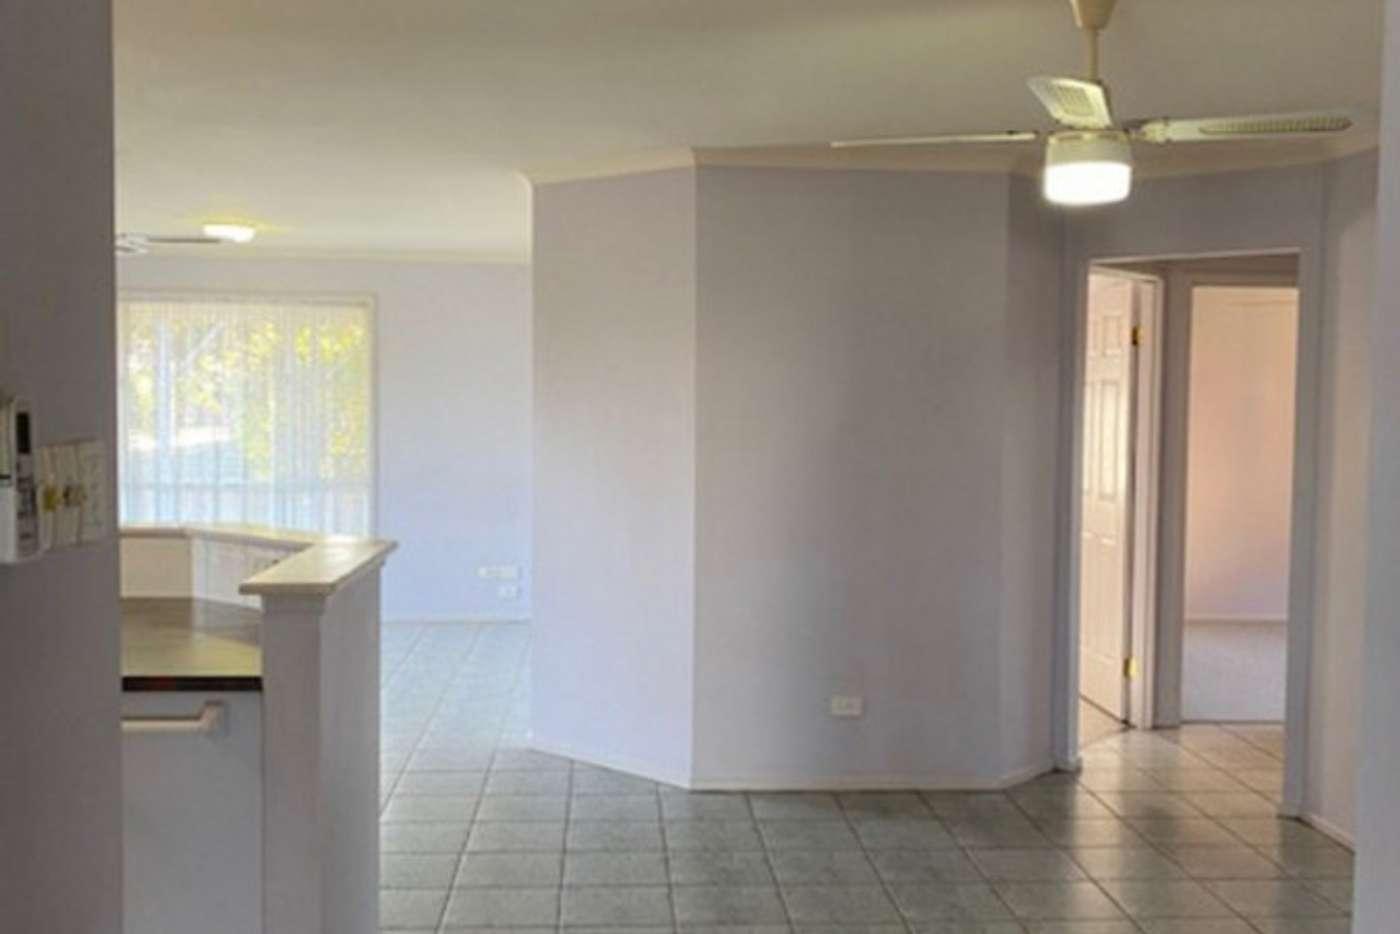 Sixth view of Homely house listing, 45 Warana Avenue, Steiglitz QLD 4207